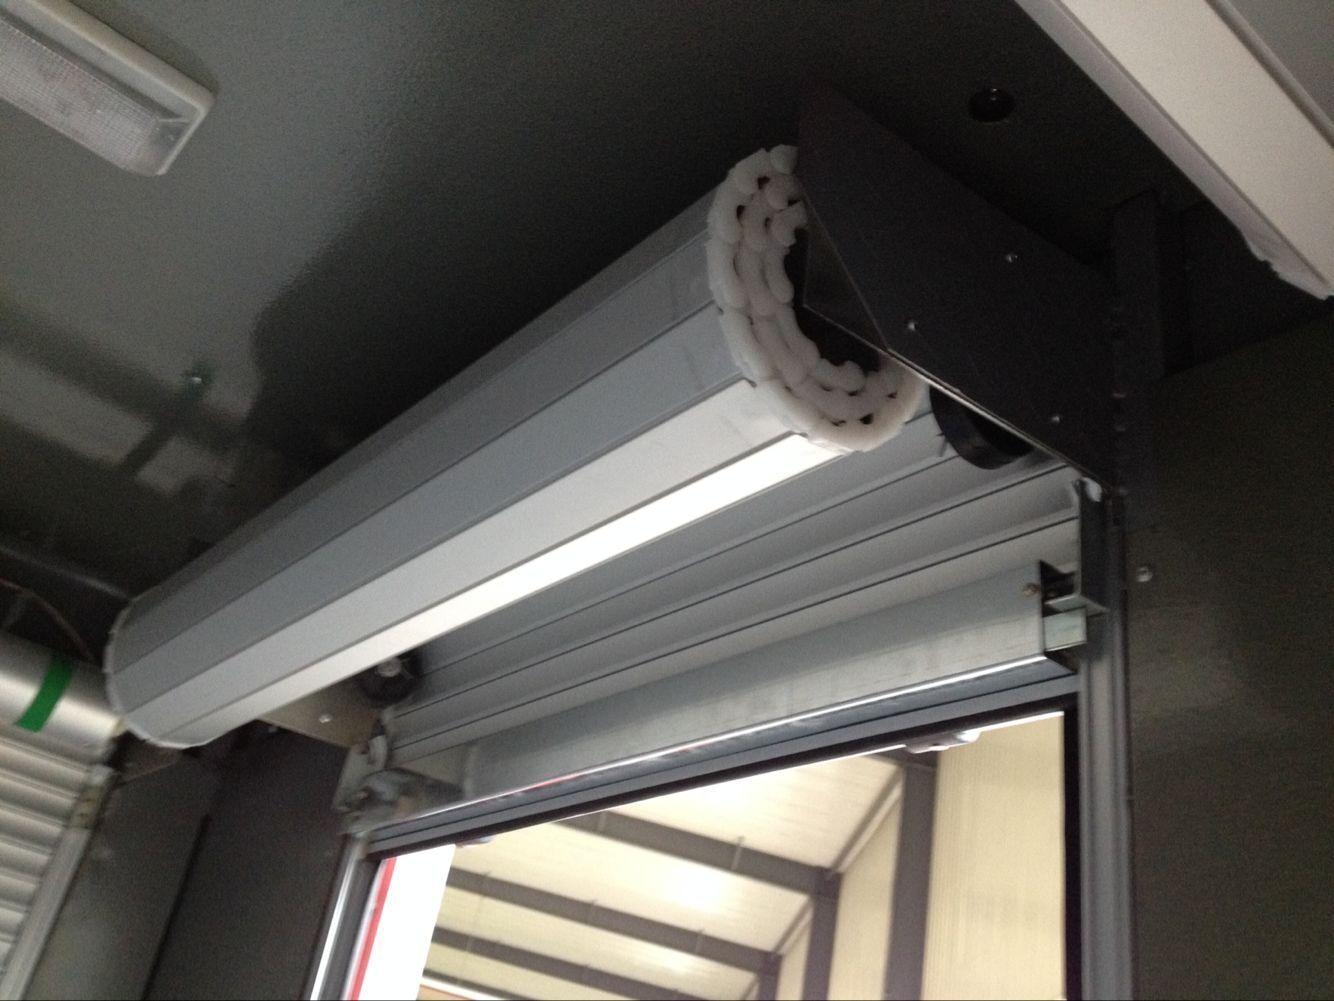 Truck Aluminium Rolling Shutter Door Emergency Rescue Vehicles Parts 1